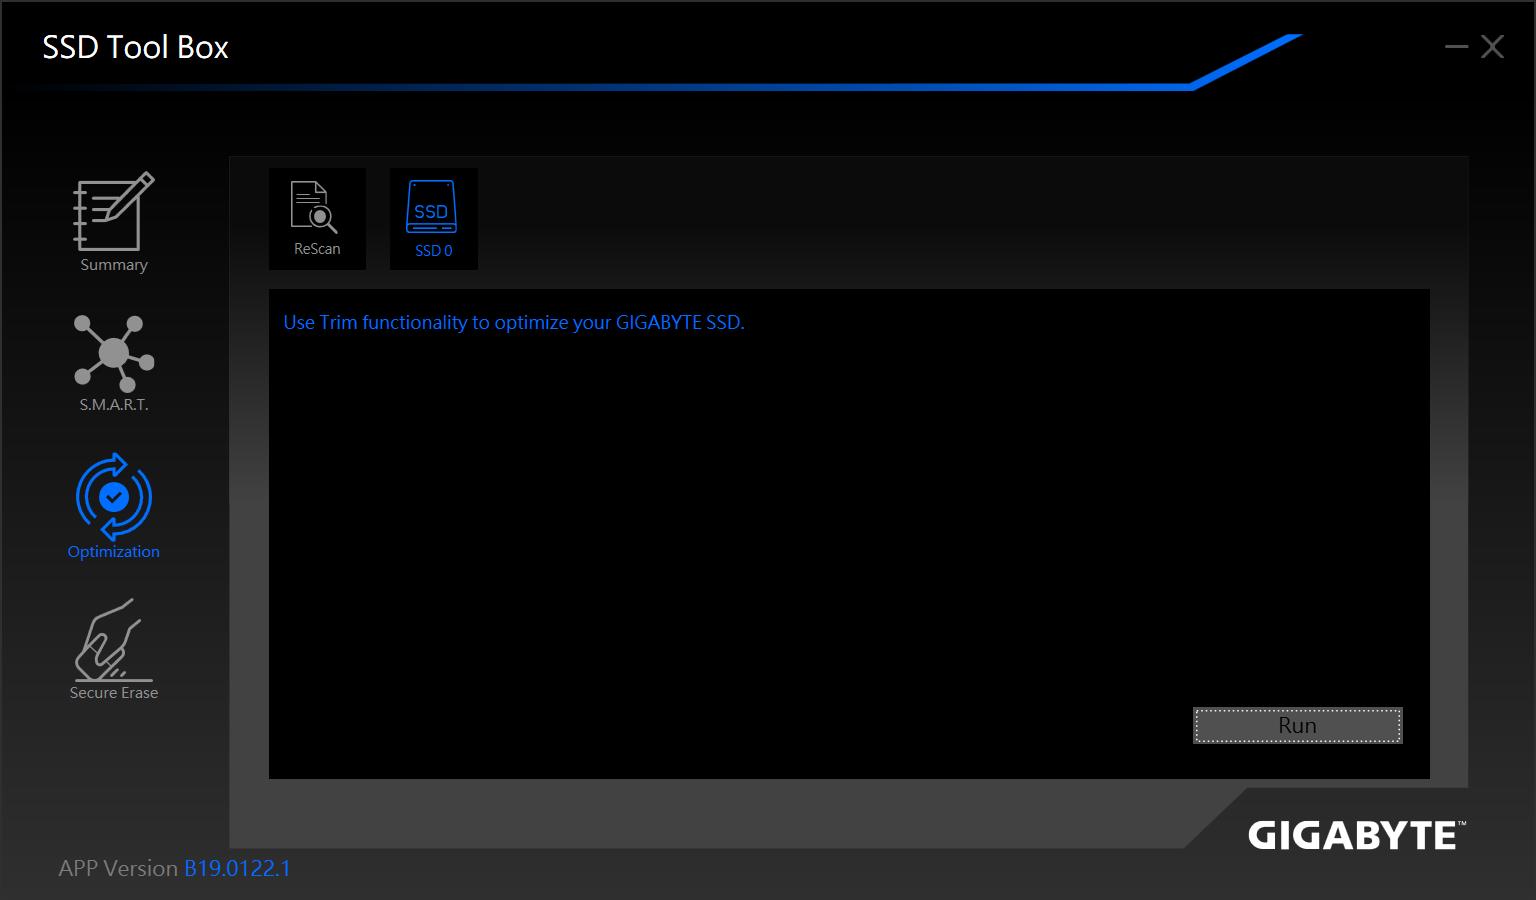 GIGABYTE SSD 120GB | Solid State Drive (SSD) - GIGABYTE Global